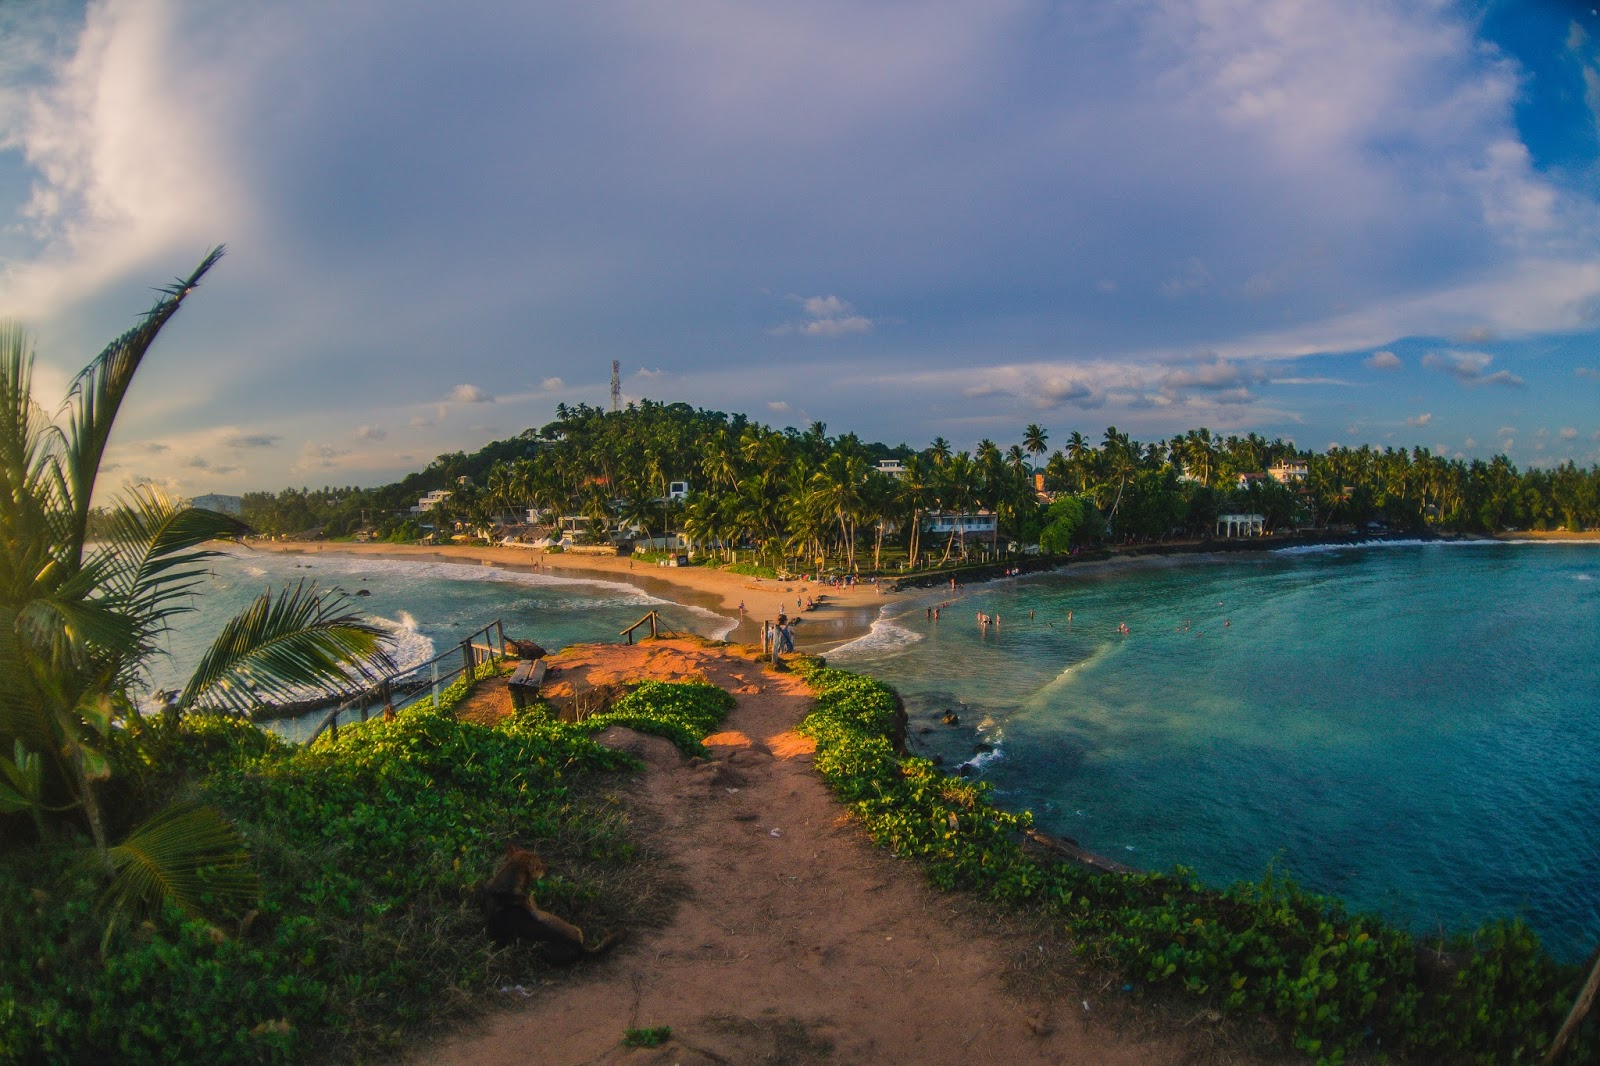 Пляж Мирисса на Шри-Ланке